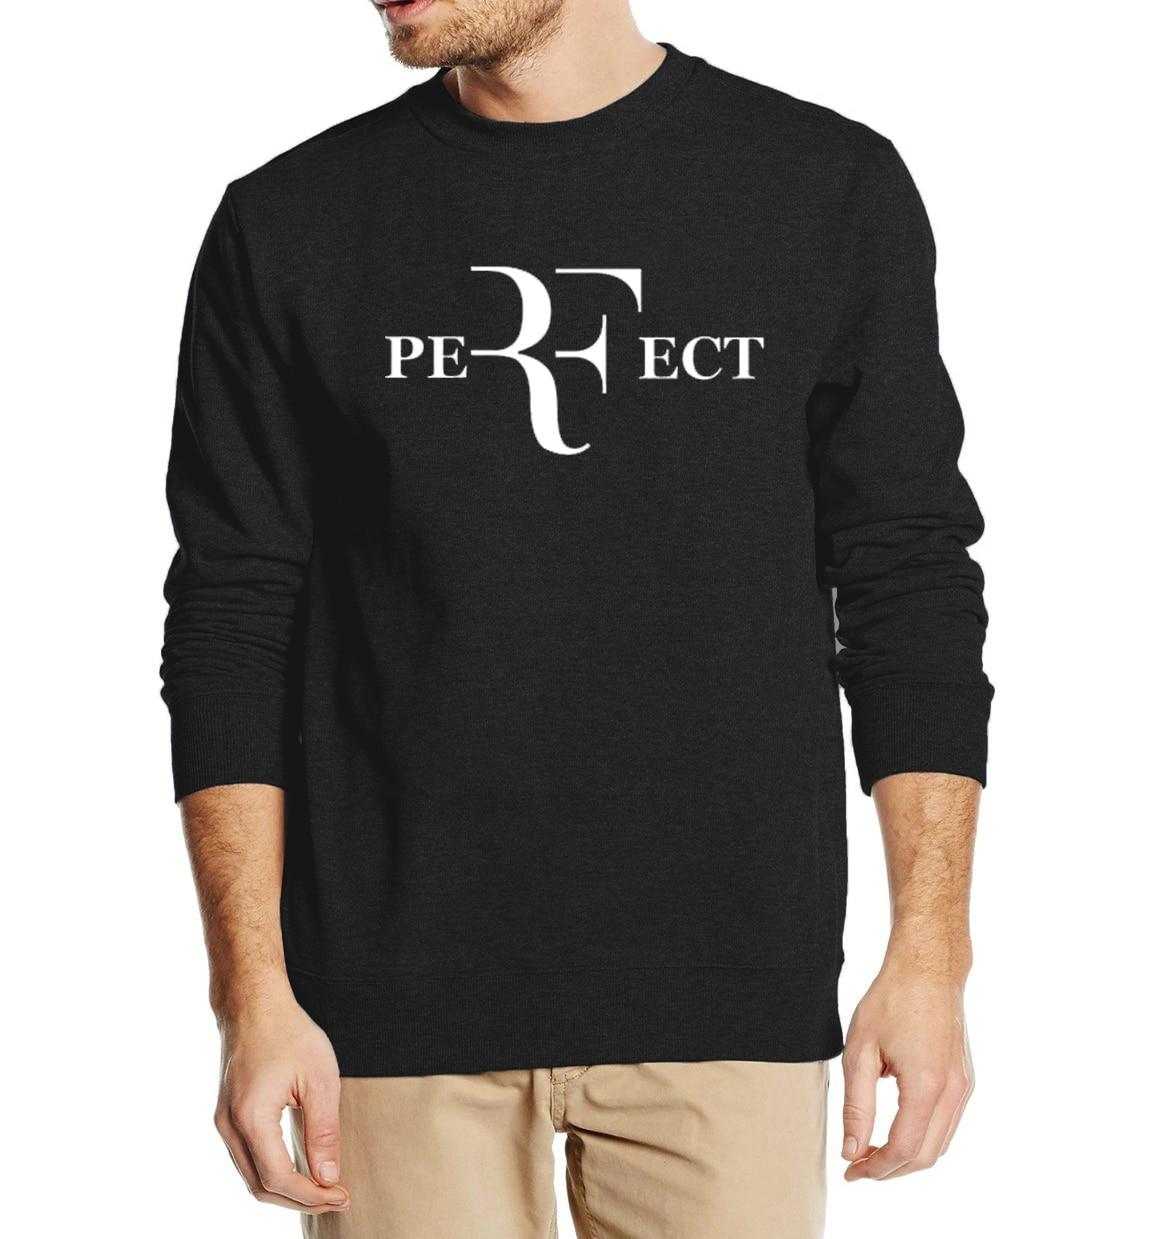 Shirt hoodie design - Unique Design Perfect Sweatshirt Autumn Winter Men Hoodie 2016 New Fashion Cool Streetwear Tracksuit Harajuku Clothing